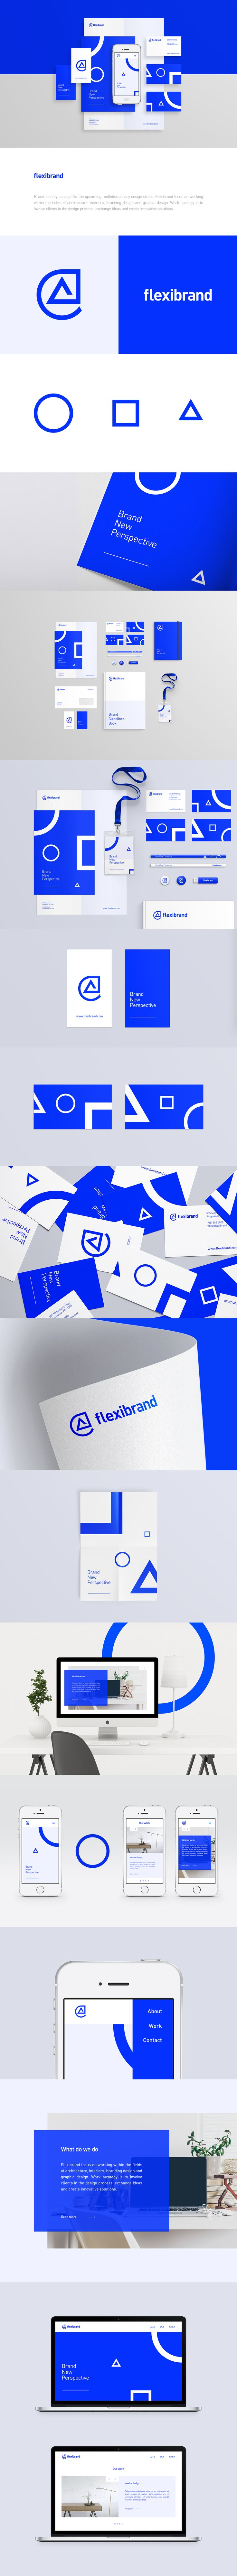 Brand Identity concept for the upcoming multidisciplinary design studio.